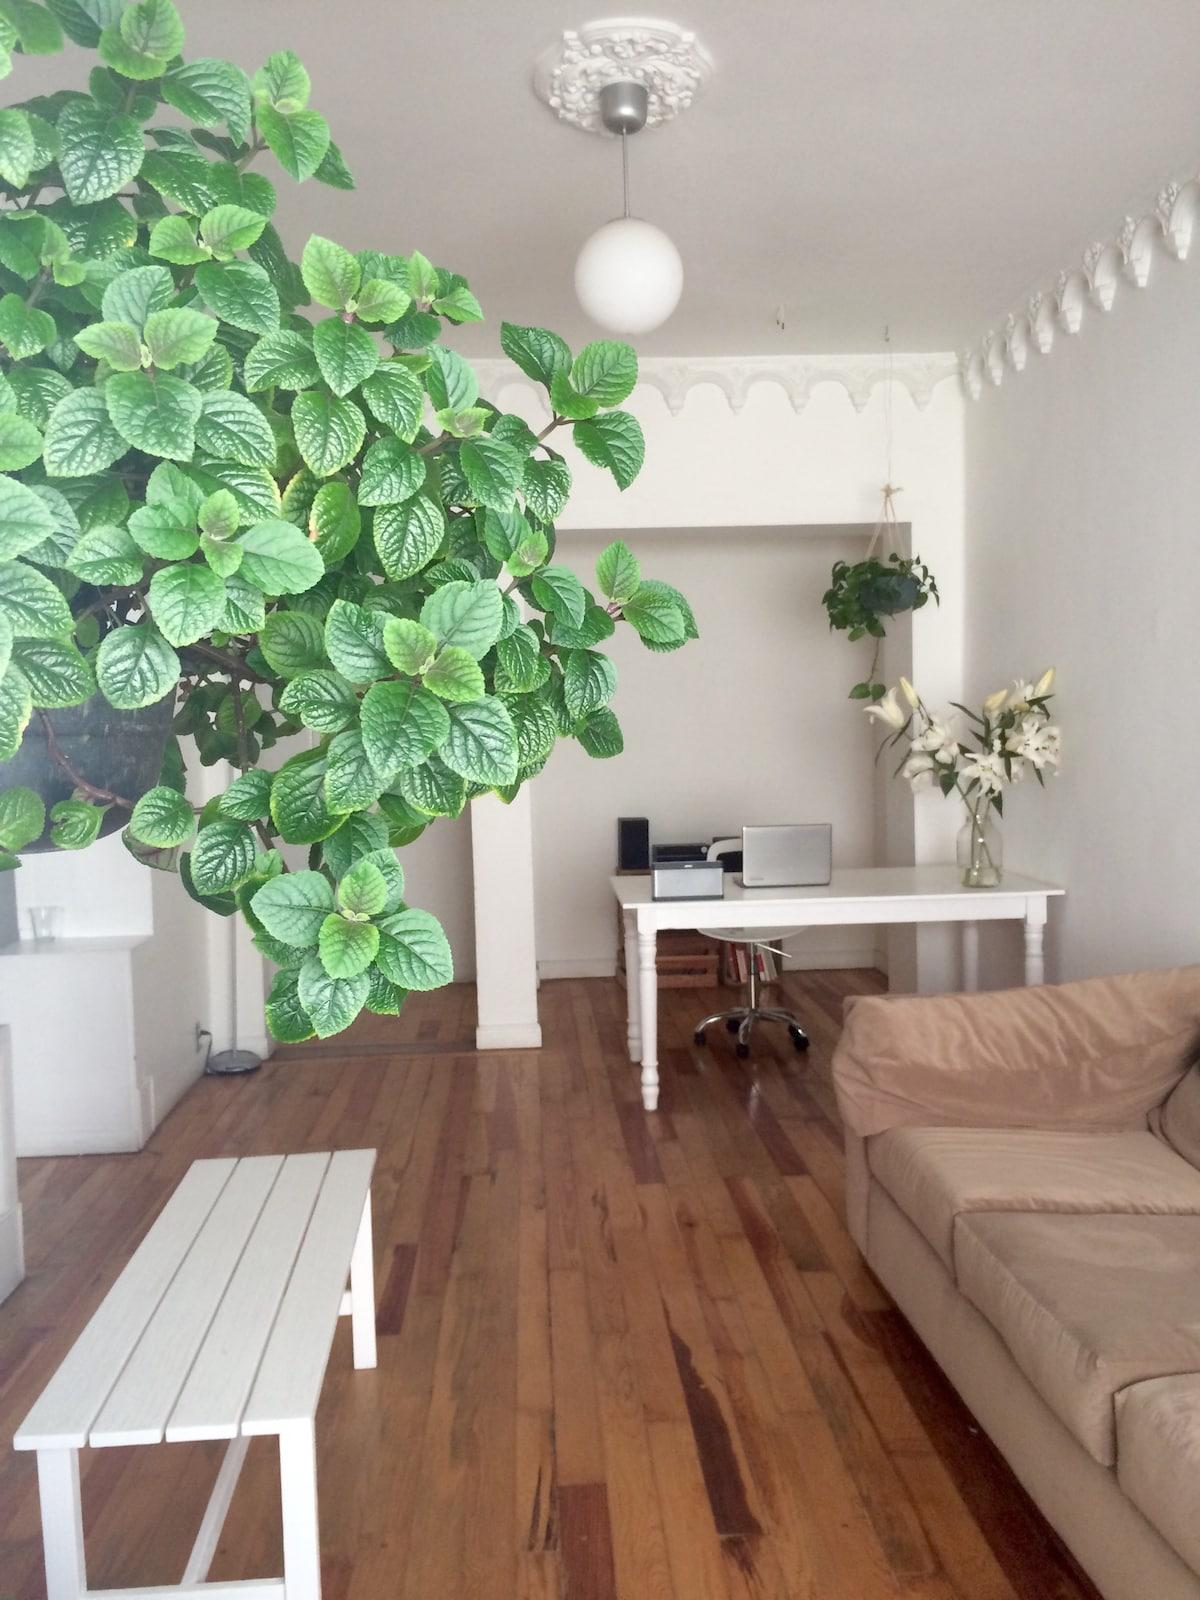 Sunny, at Condesa; full apartment